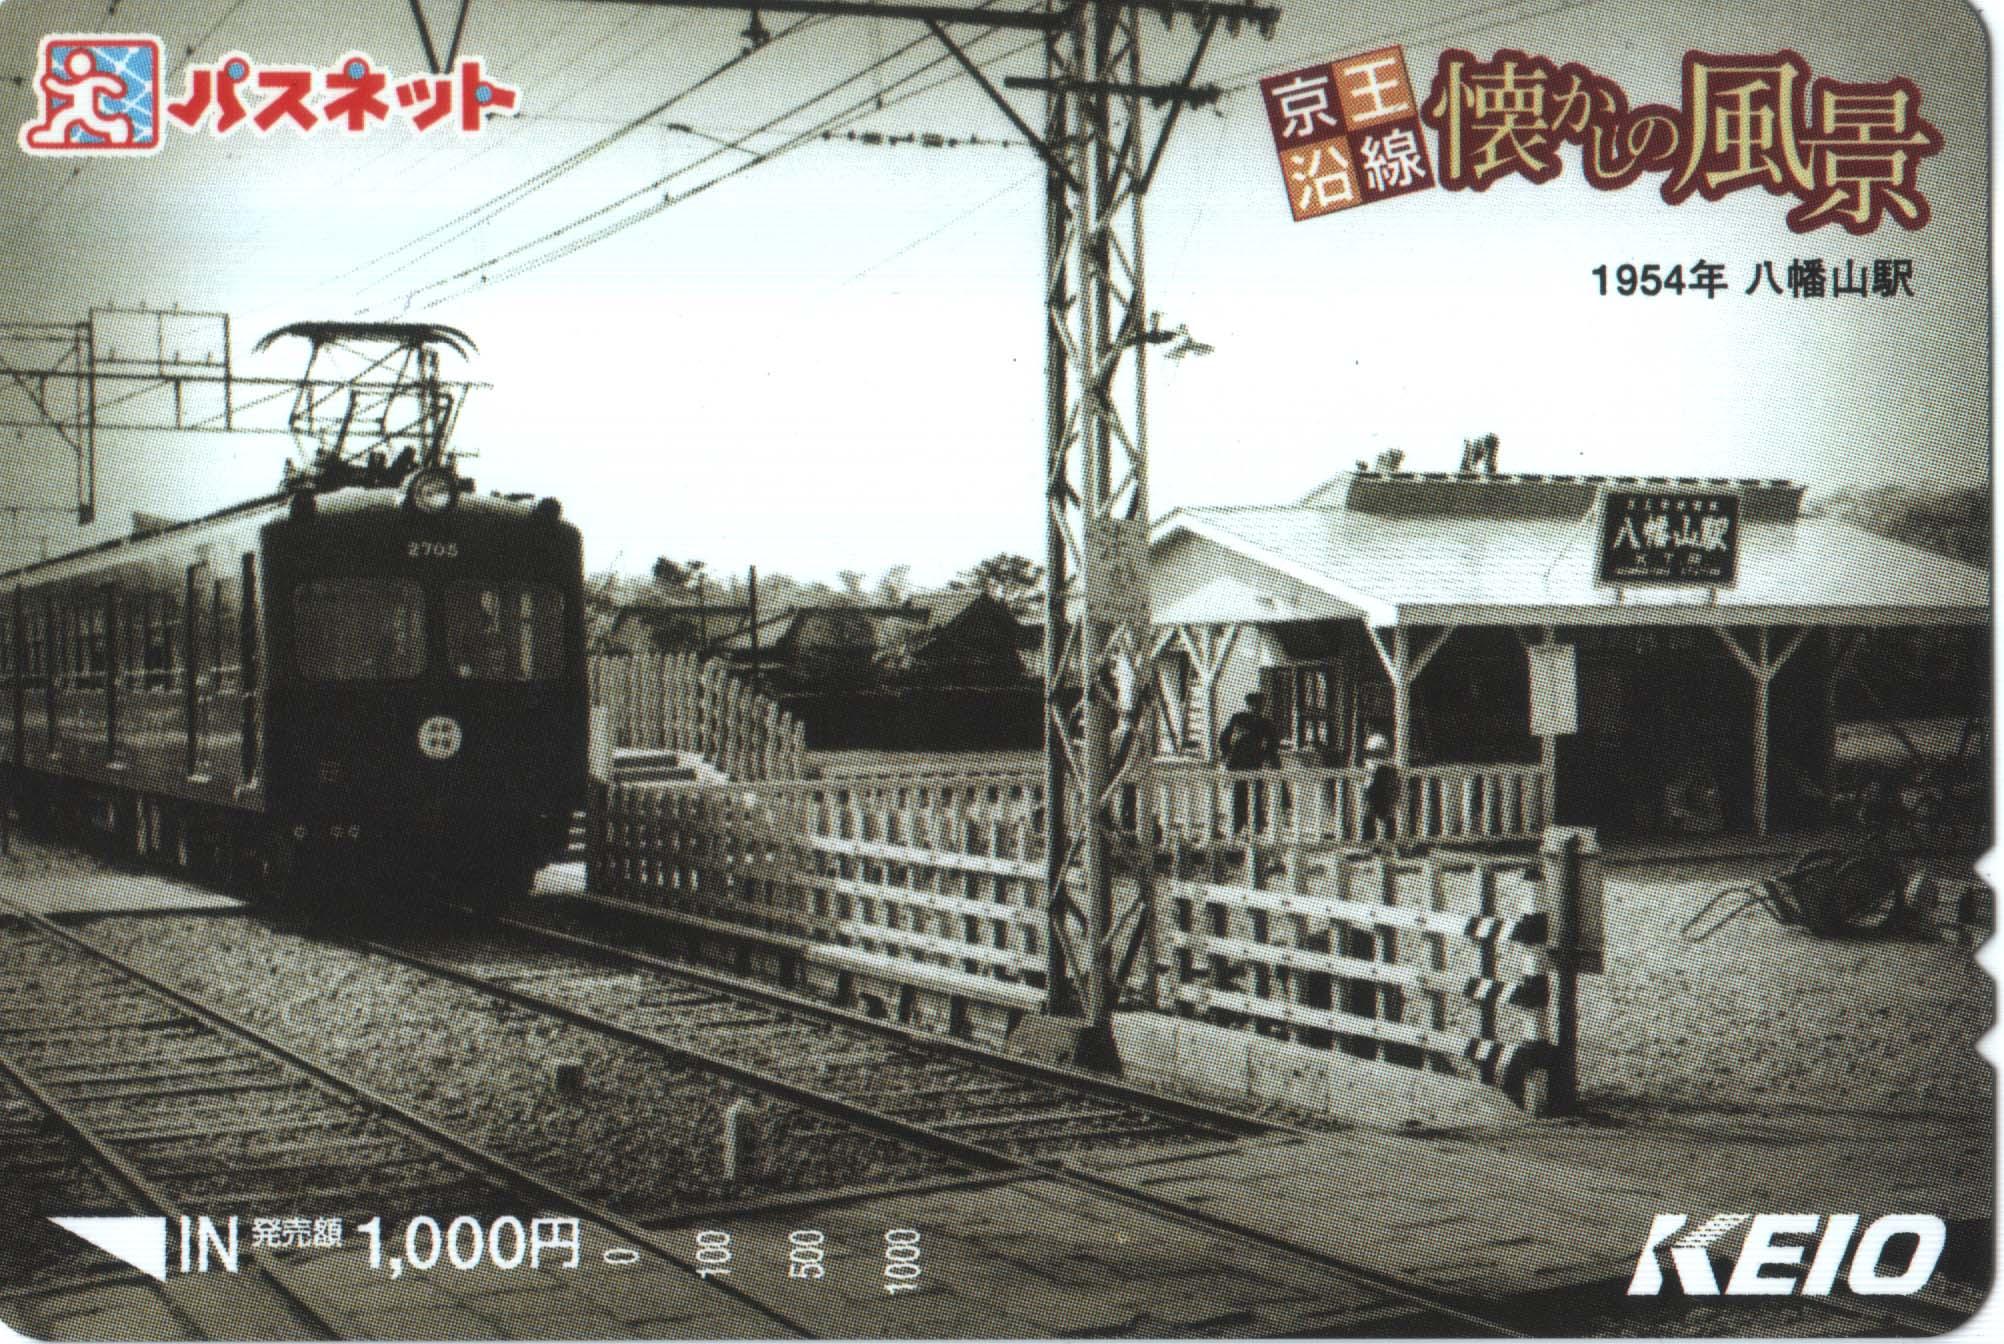 Hachiman-yama Sta. 1954